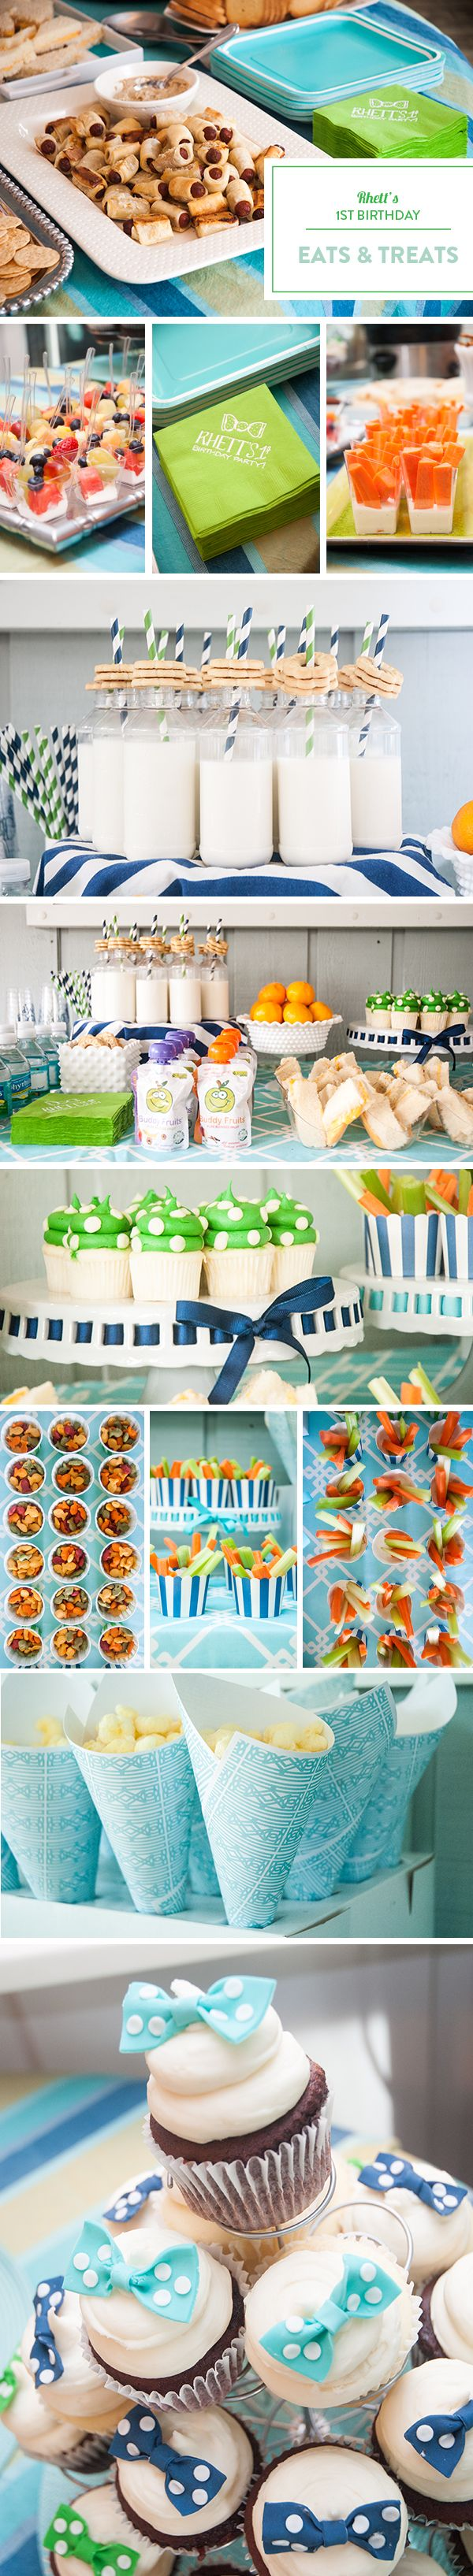 Rhett's Southern First Birthday Party by Emily McCarthy - Party Food Presentation Ideas